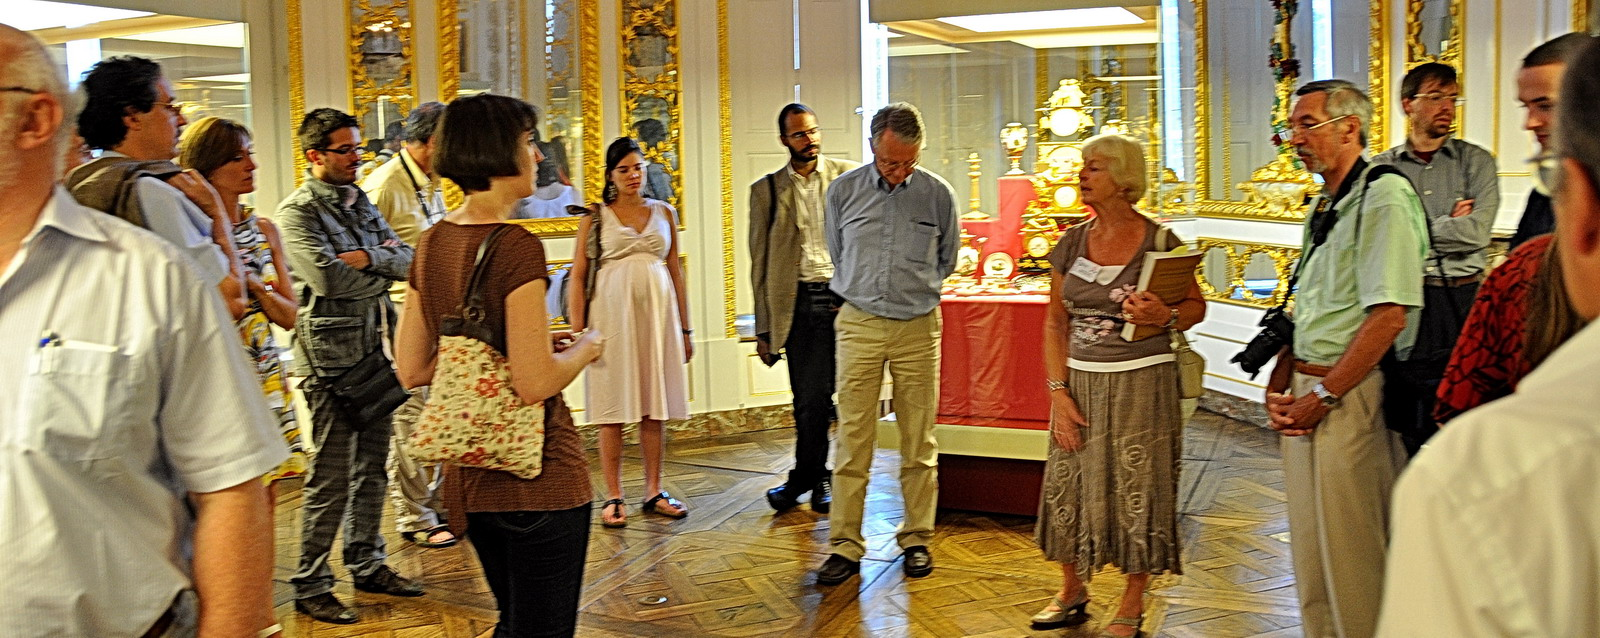 Musée Curtius - un public attentif